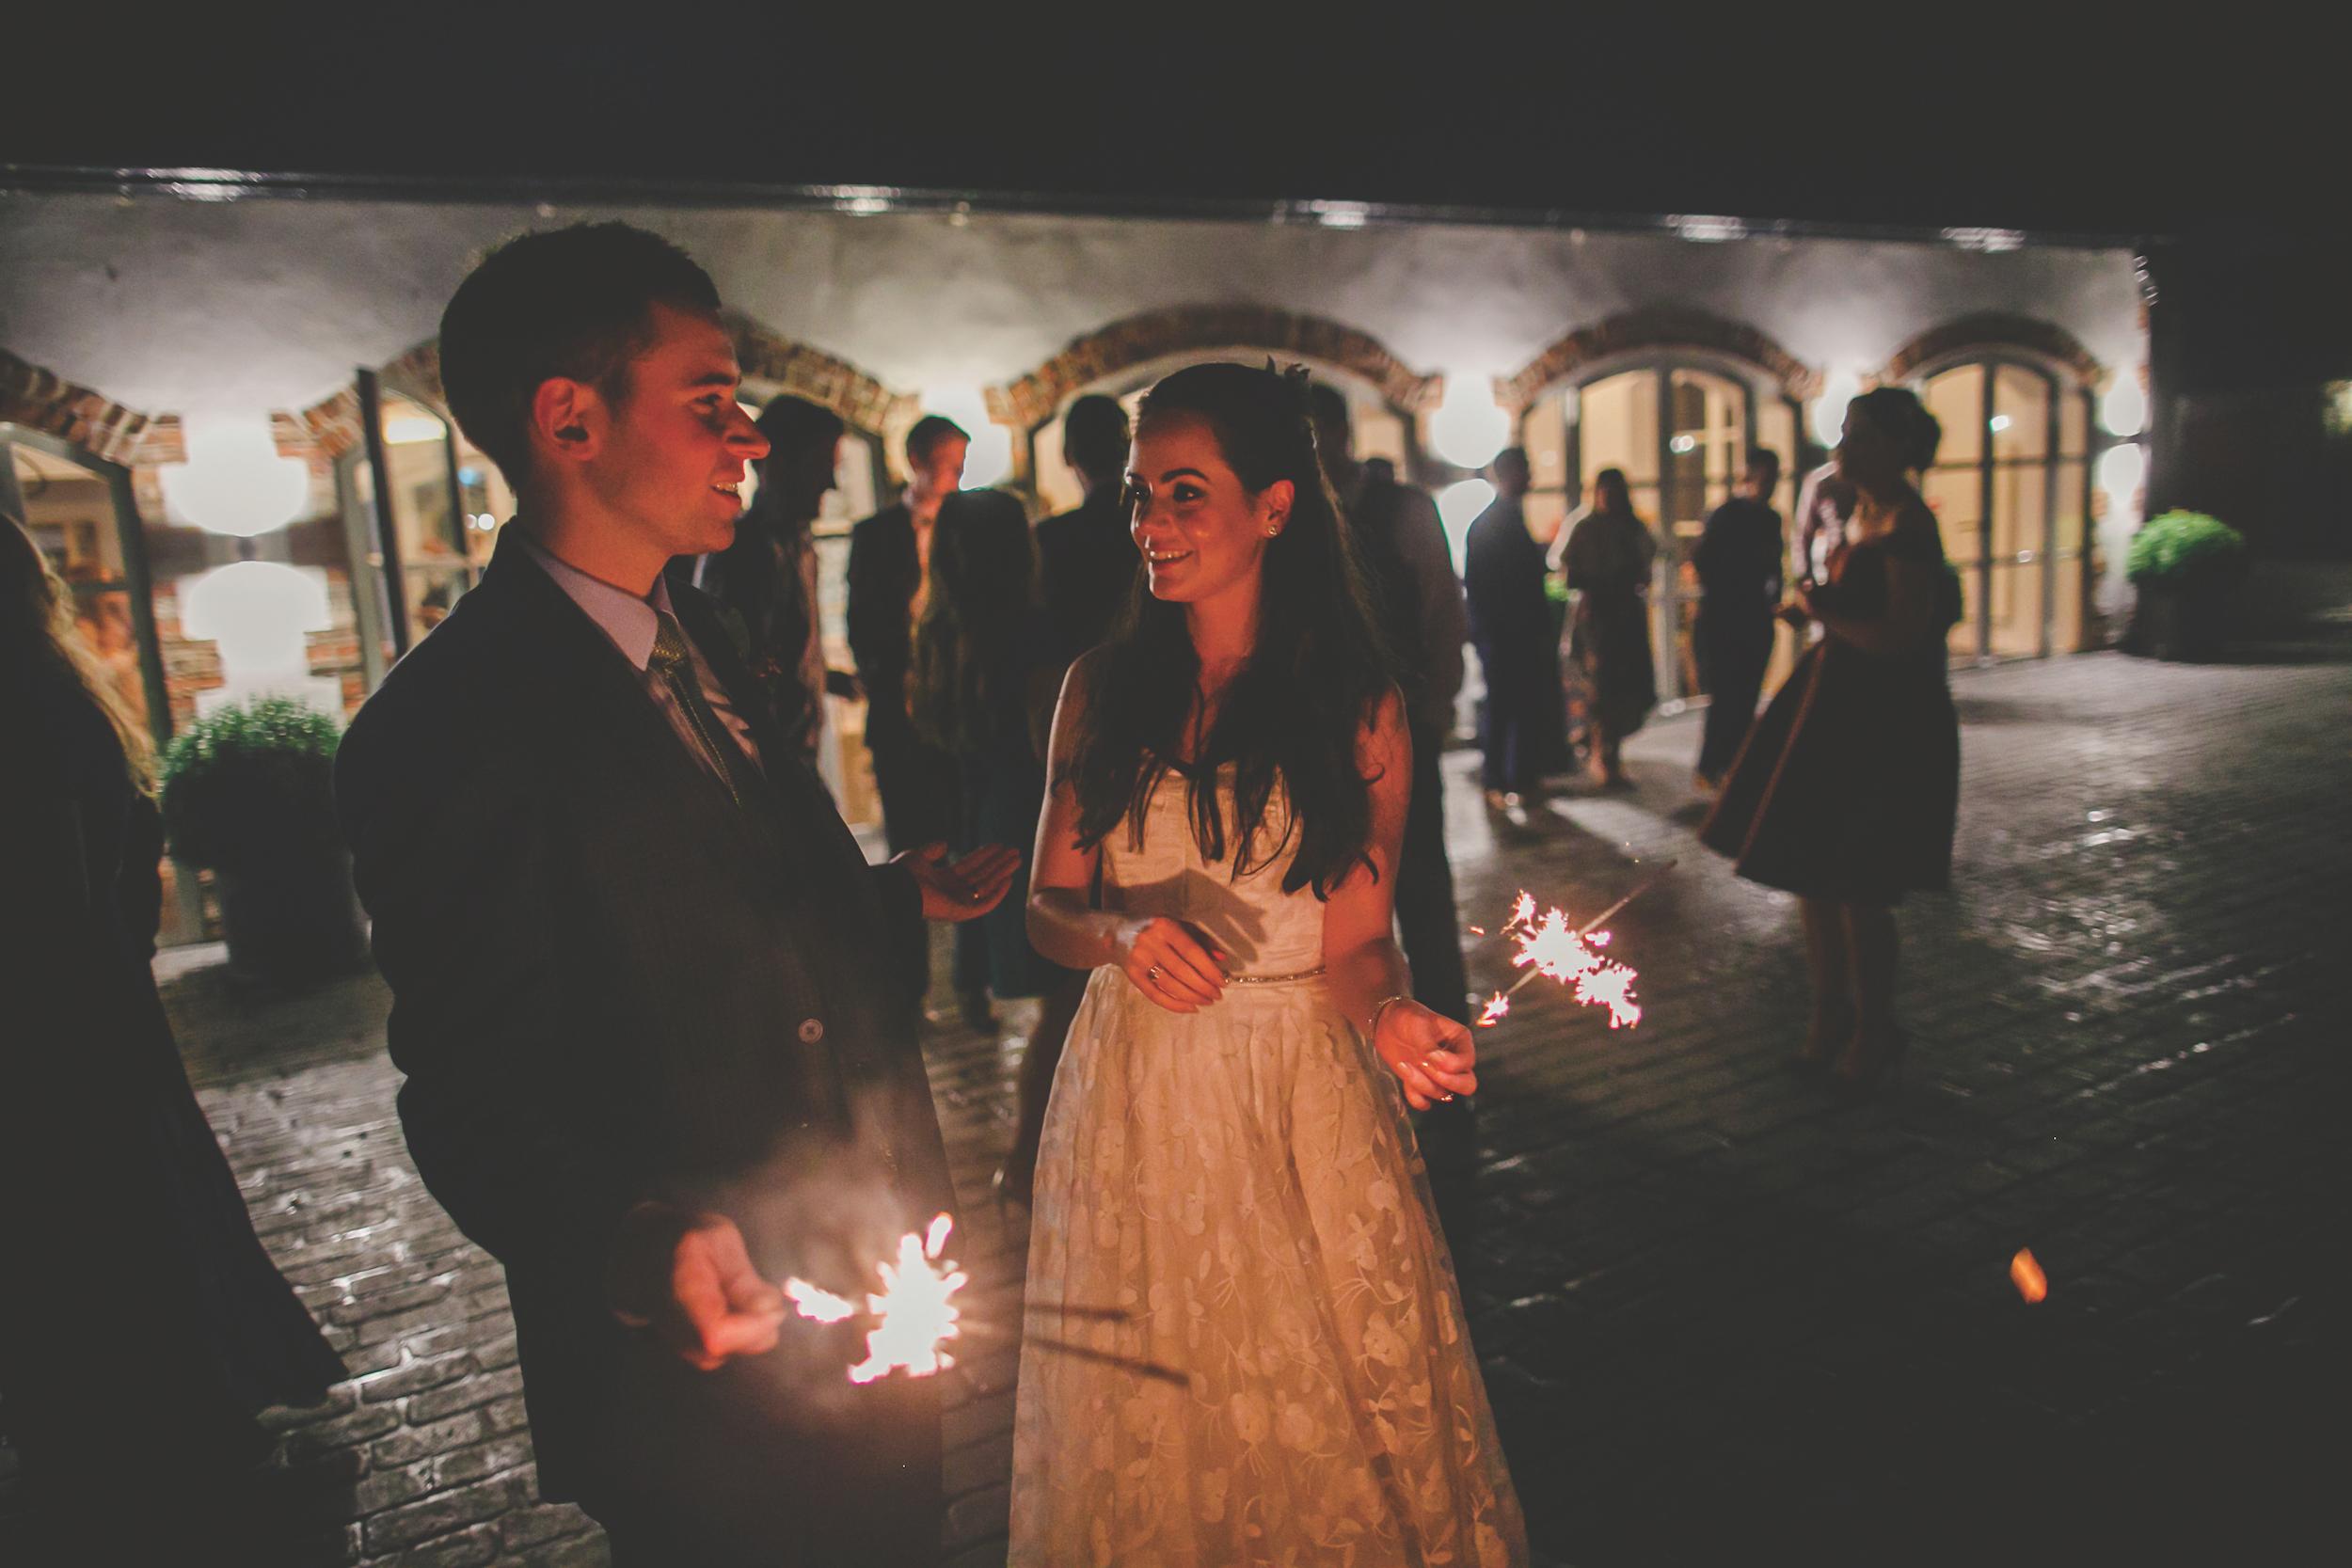 gather_and_tides_wedding_photographer_larchfield_autumn_northern_ireland_Wedding_inspire_Weddings_13.jpeg